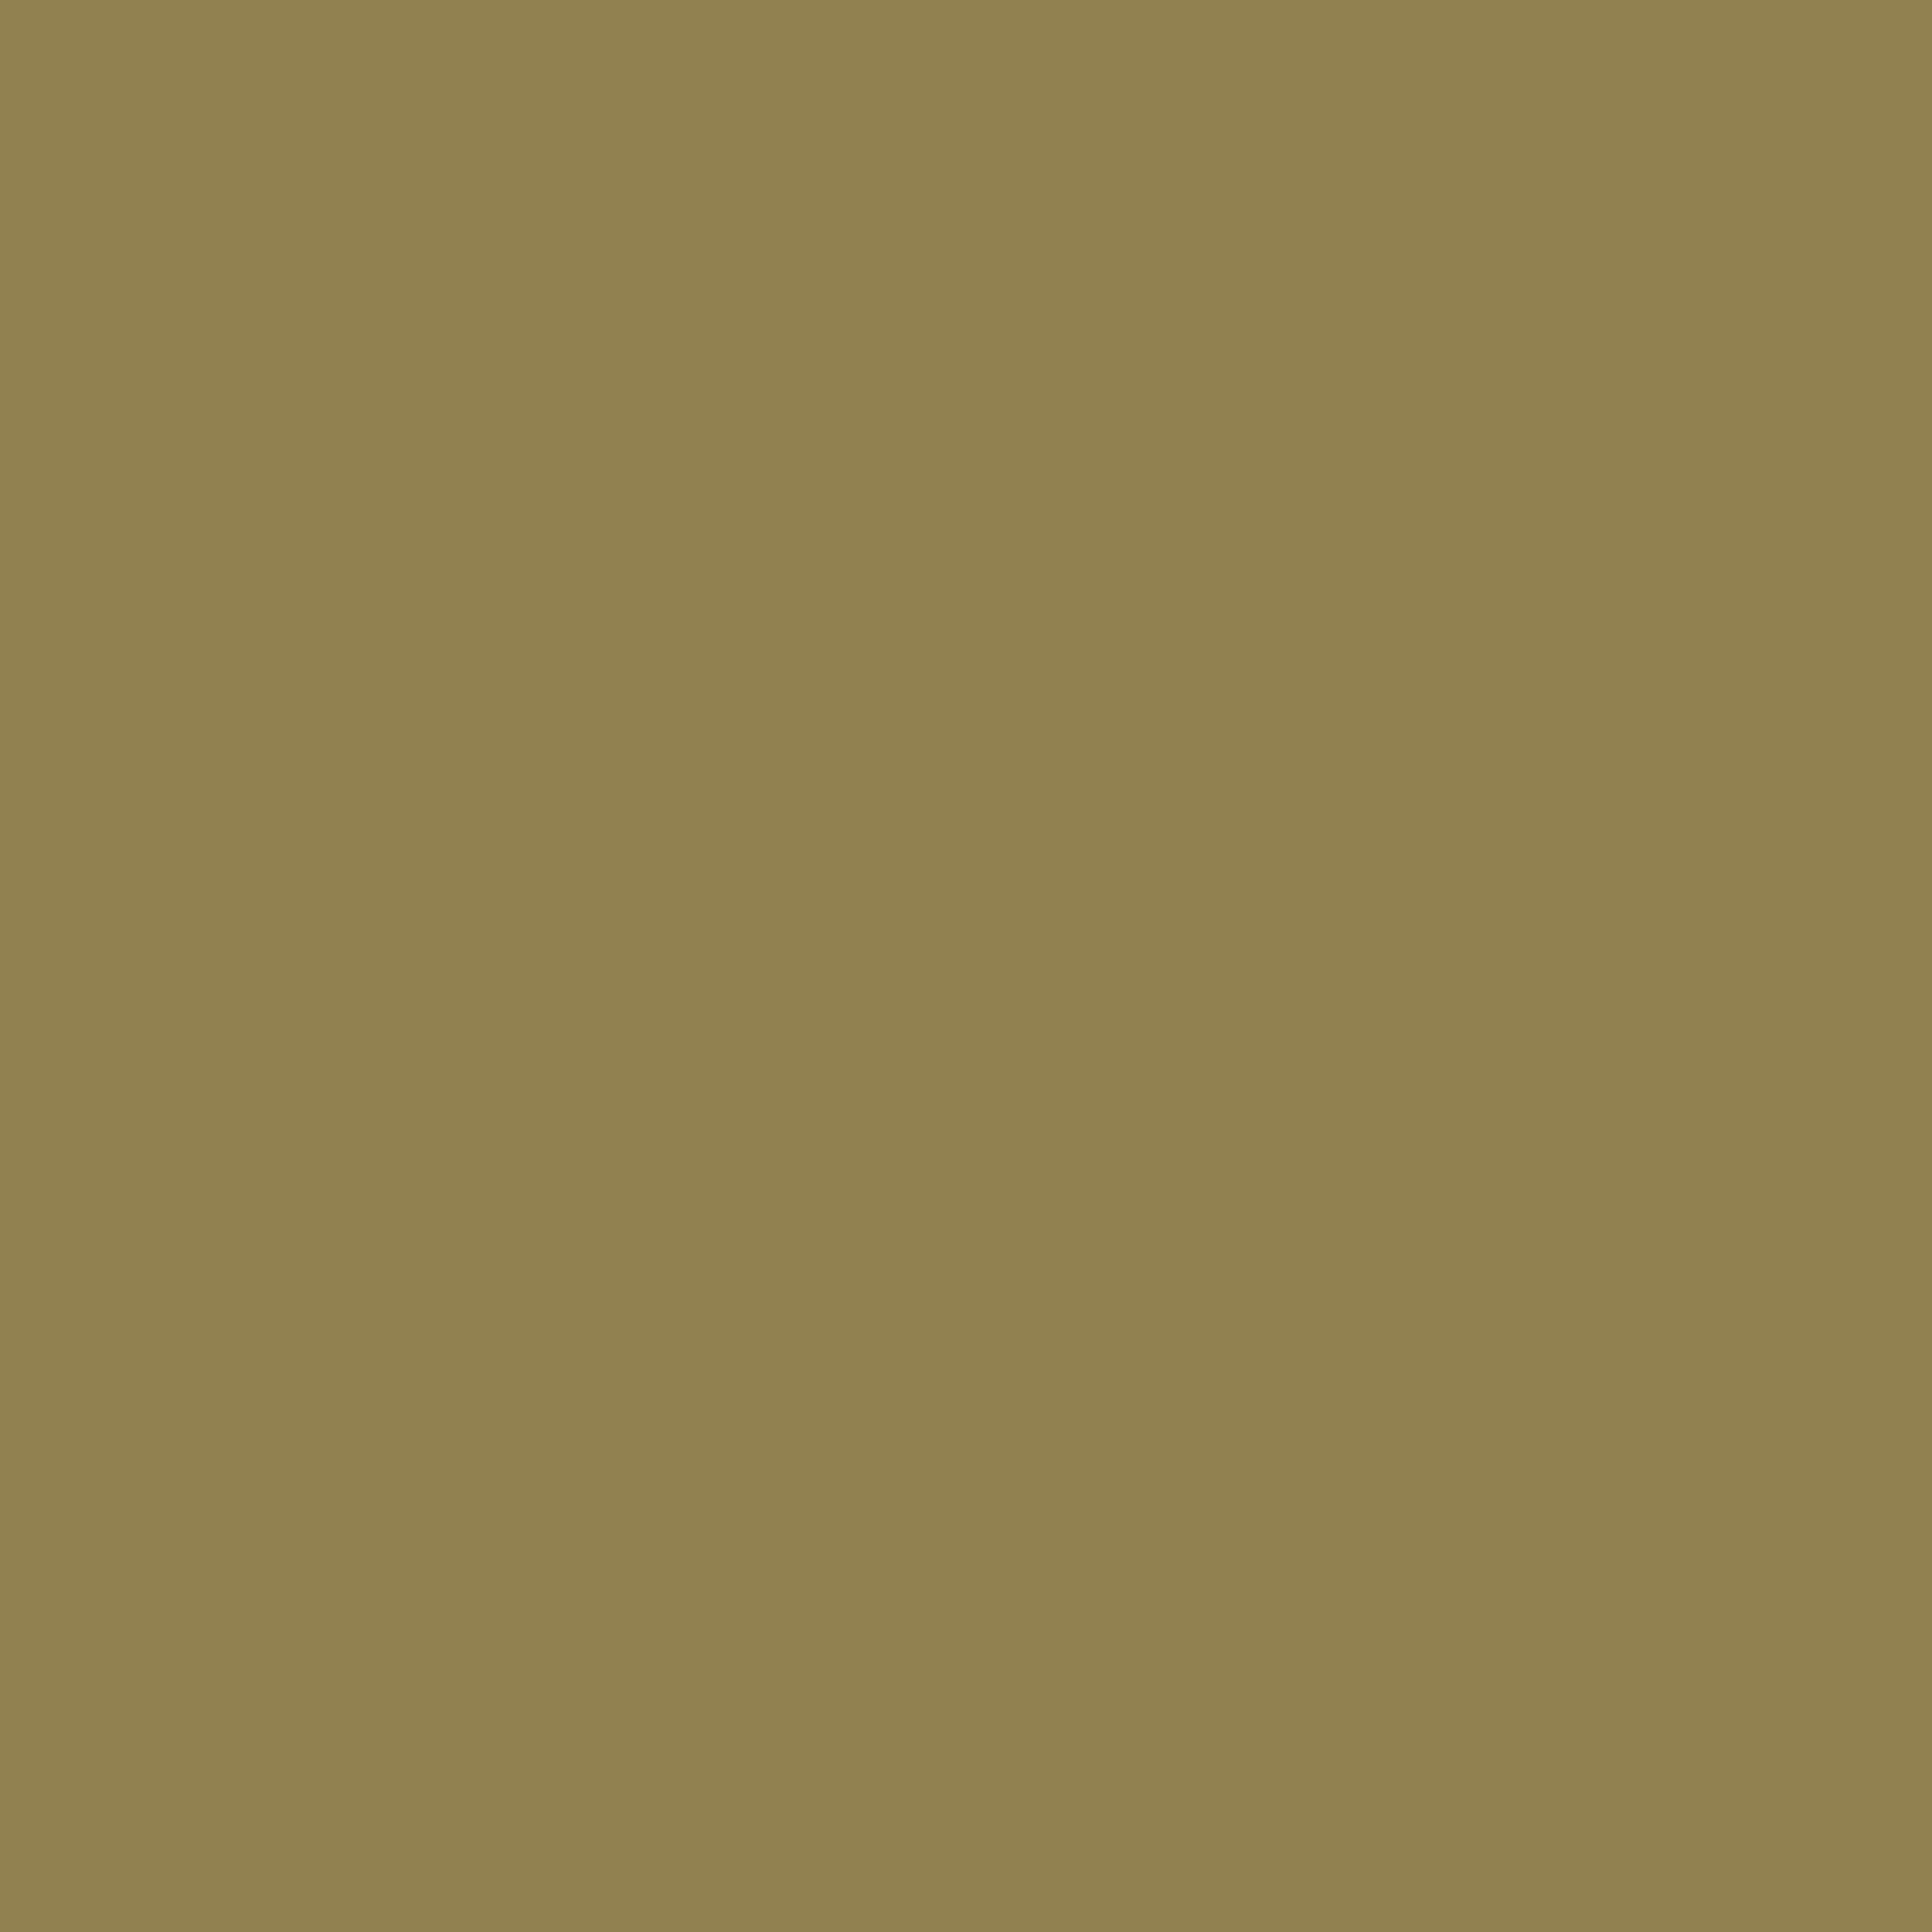 2048x2048 Dark Tan Solid Color Background